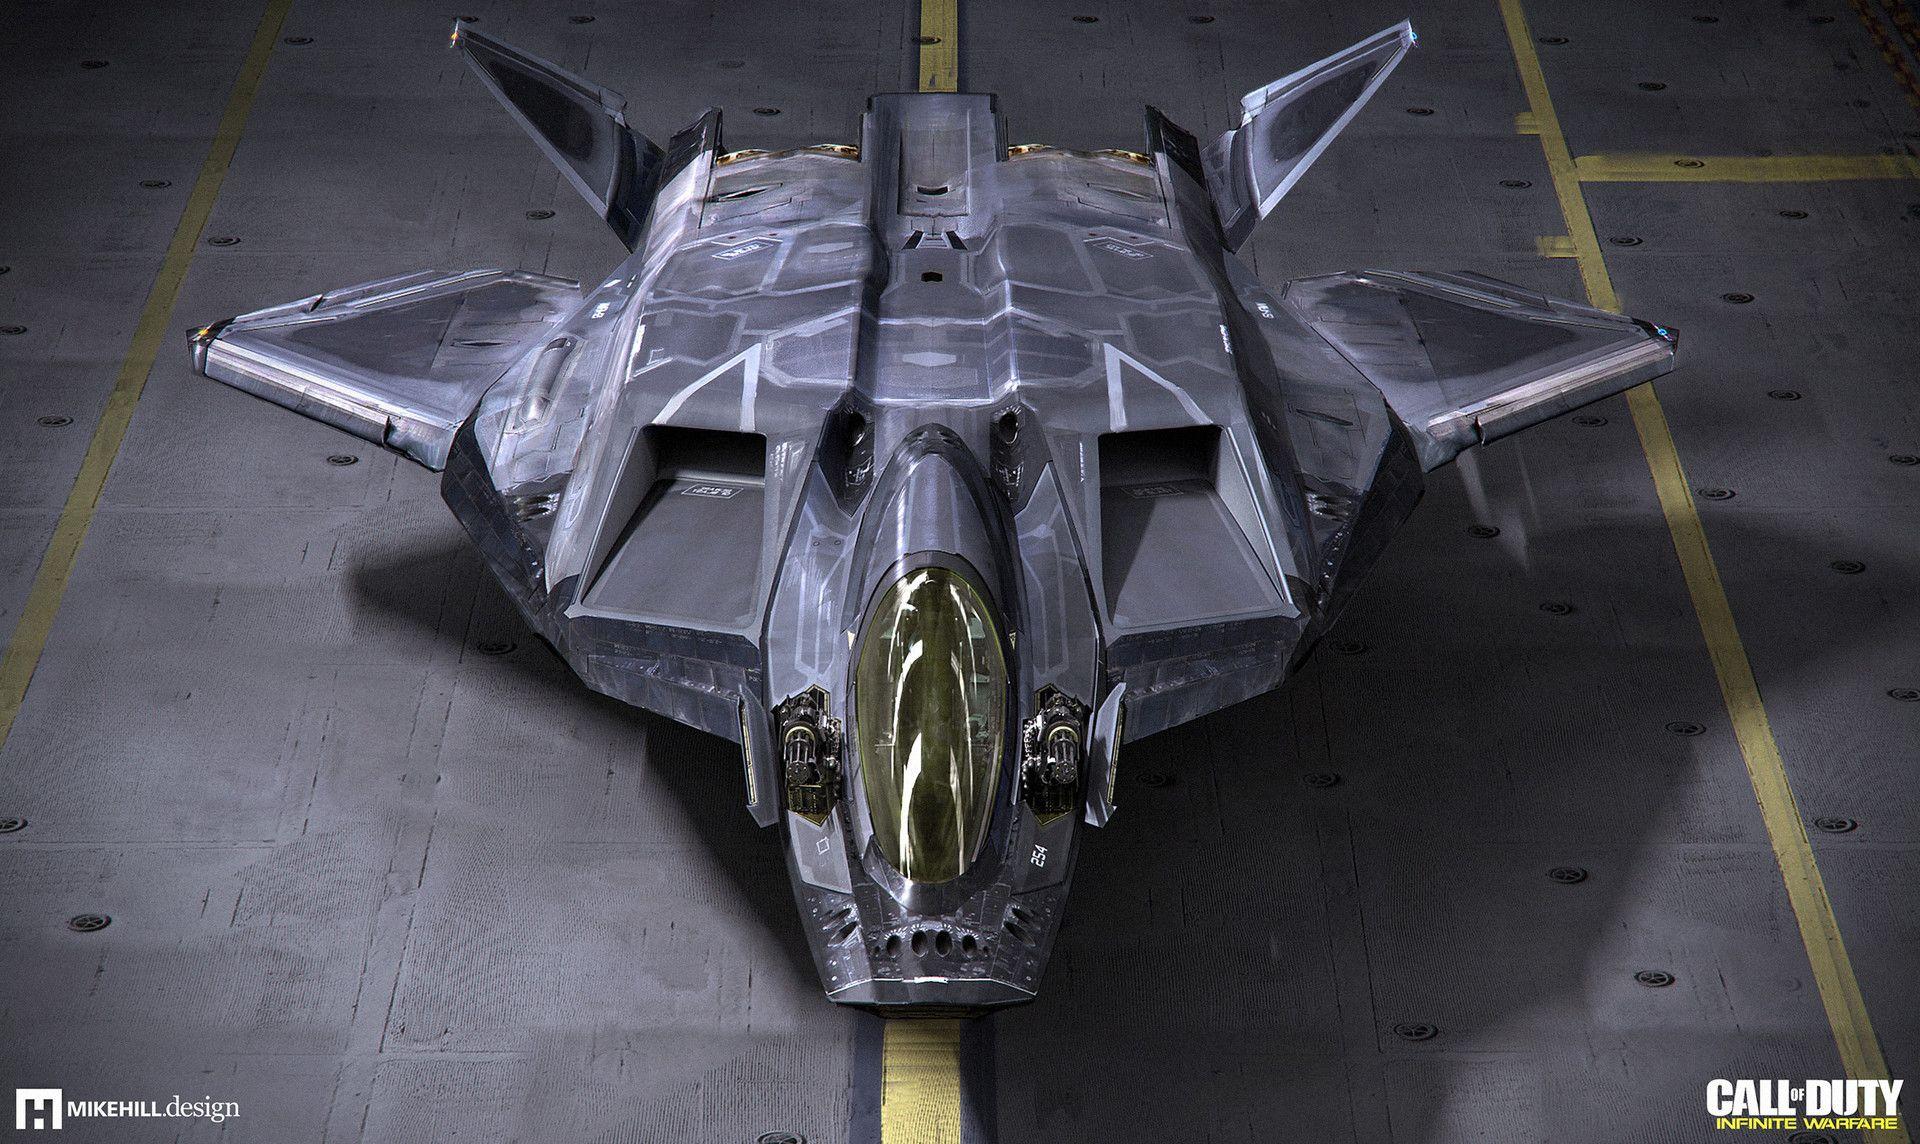 Artstation jackal call of duty infinite warfare mike hill aircrafts pinterest - Infinite warfare ship assault ...